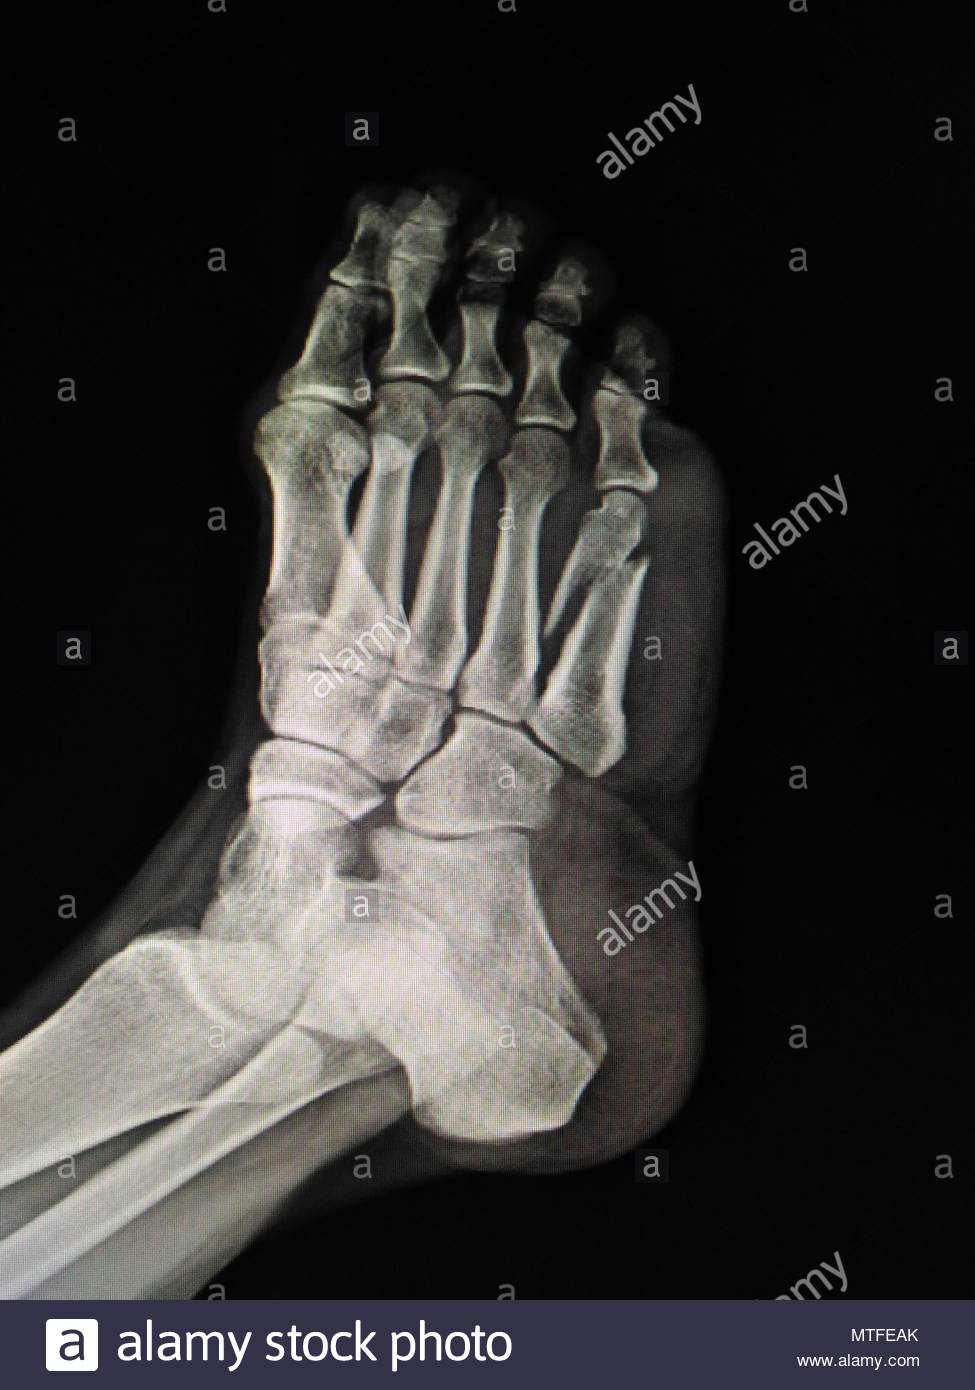 Anatomy Bone Broken Medicine Picture Stock Photos & Anatomy Bone ...